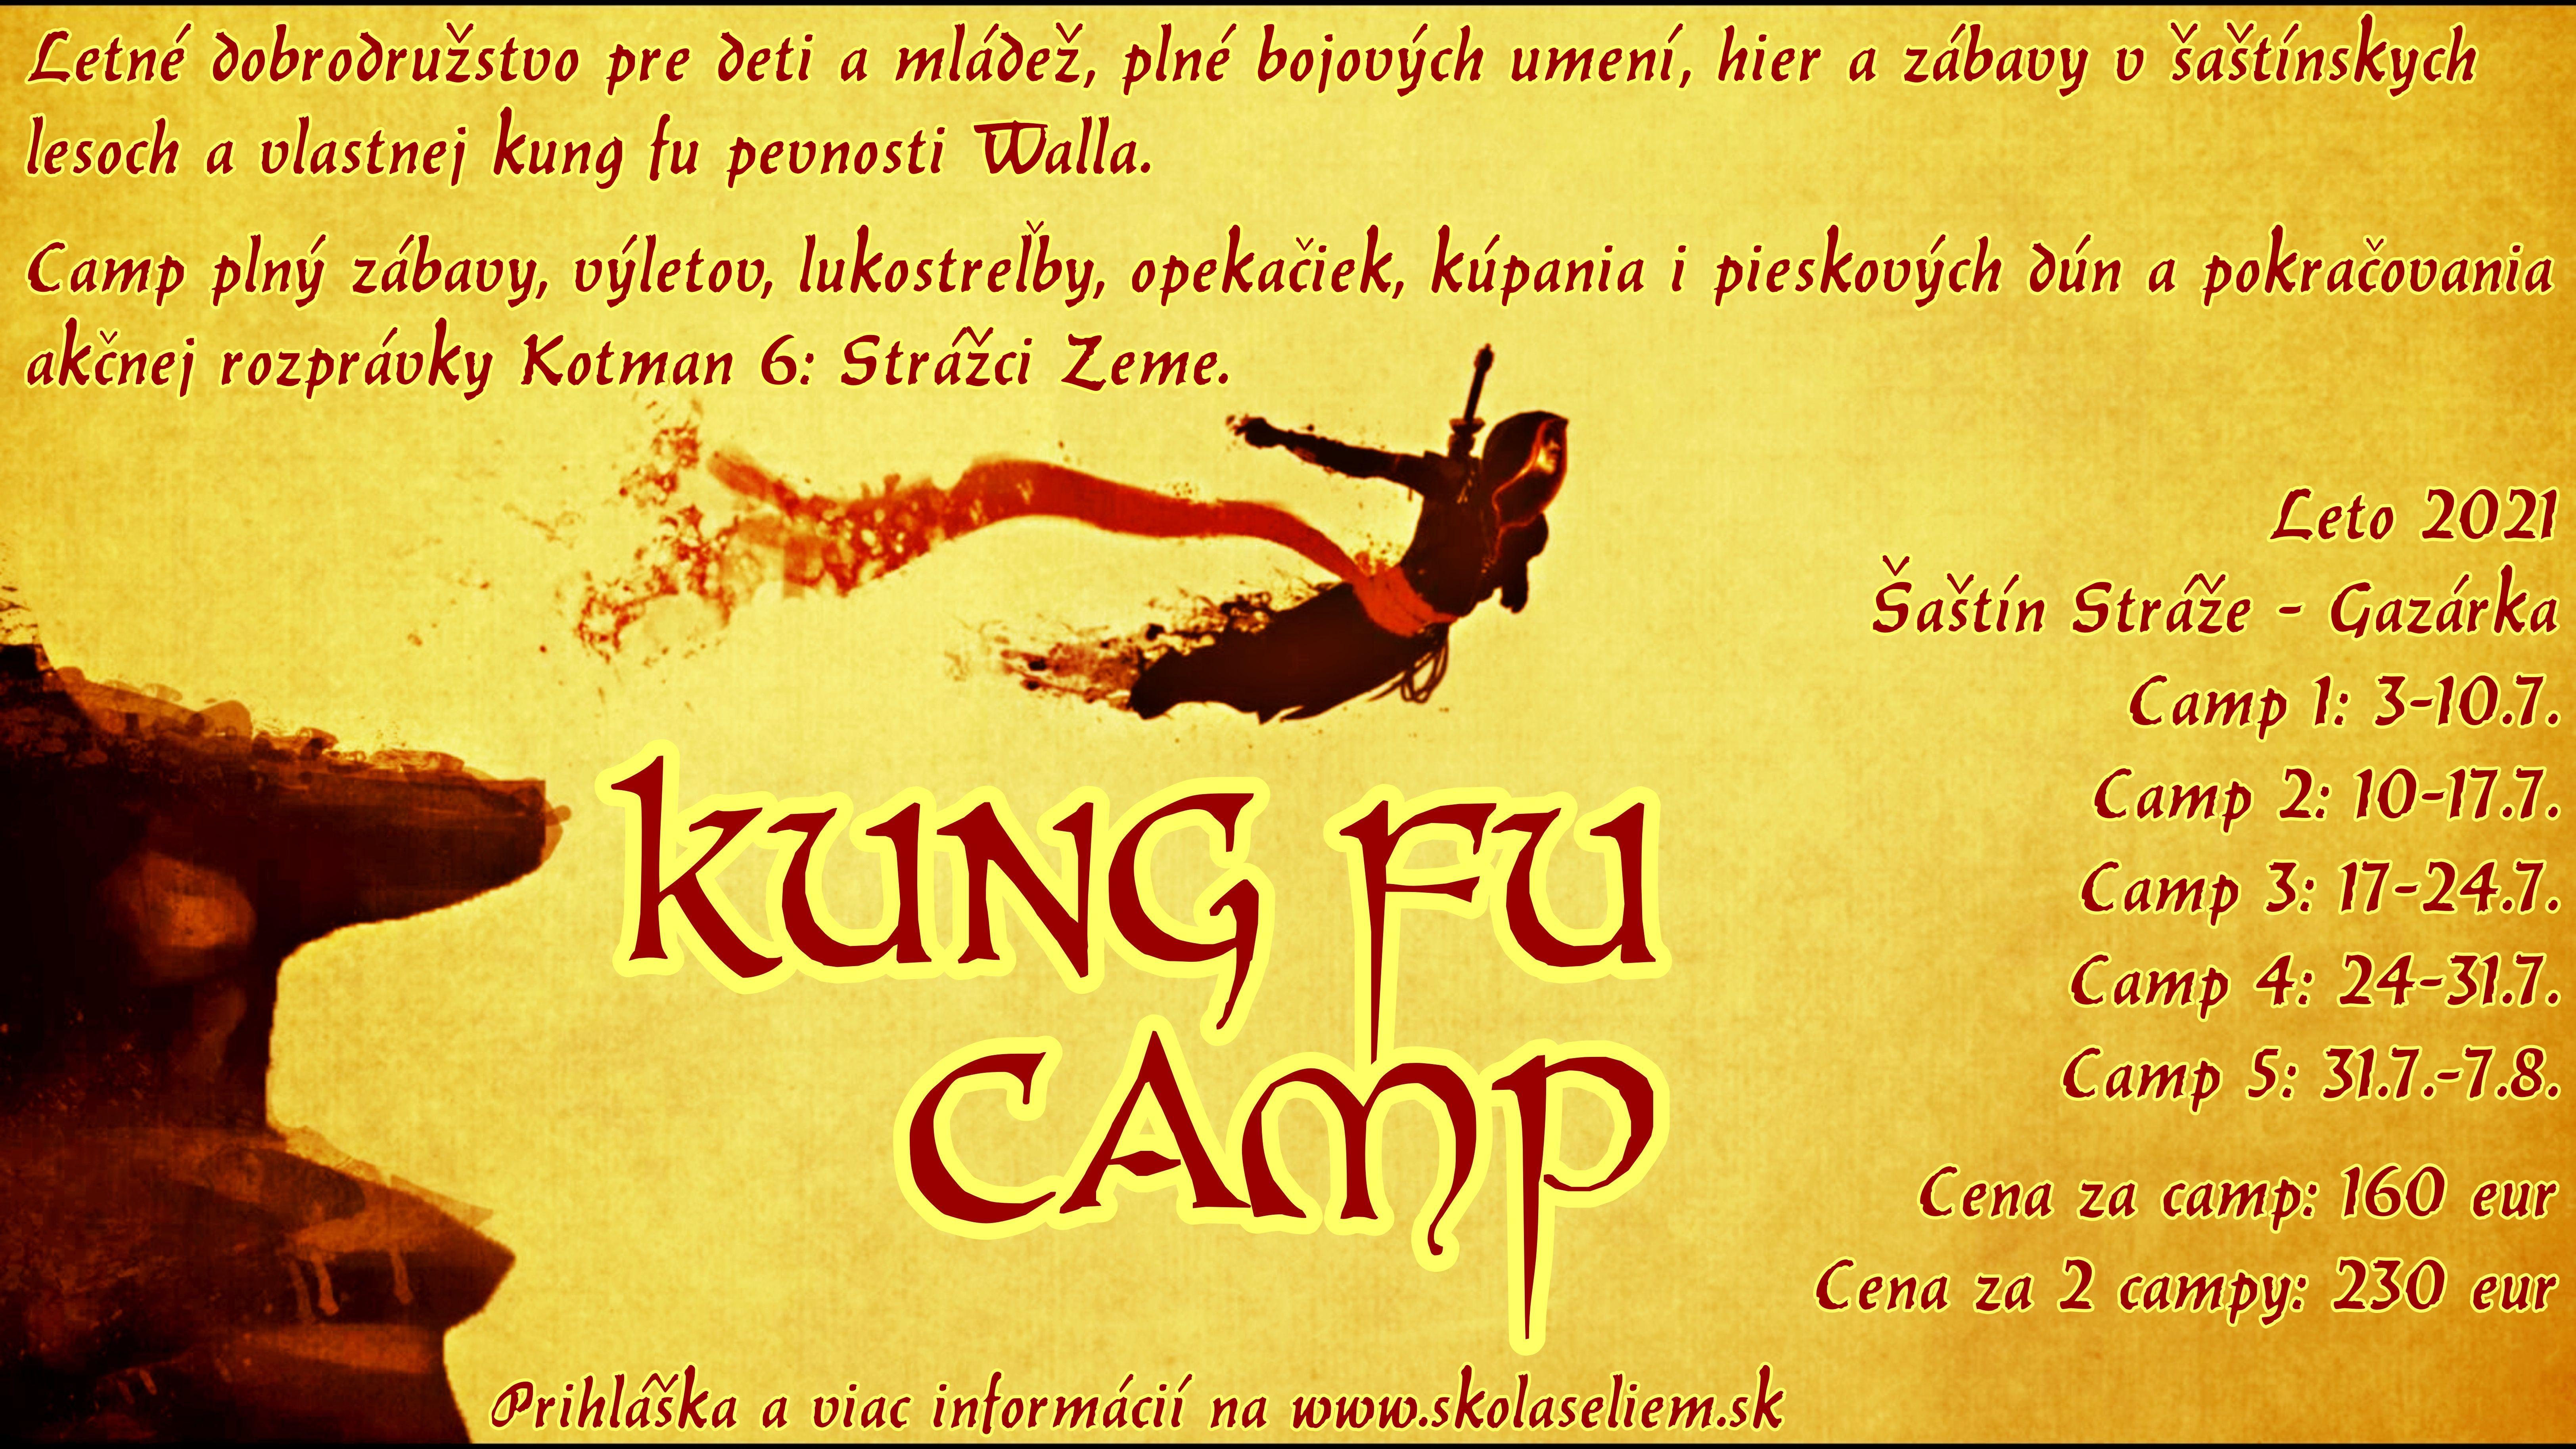 Kung fu camp 2021